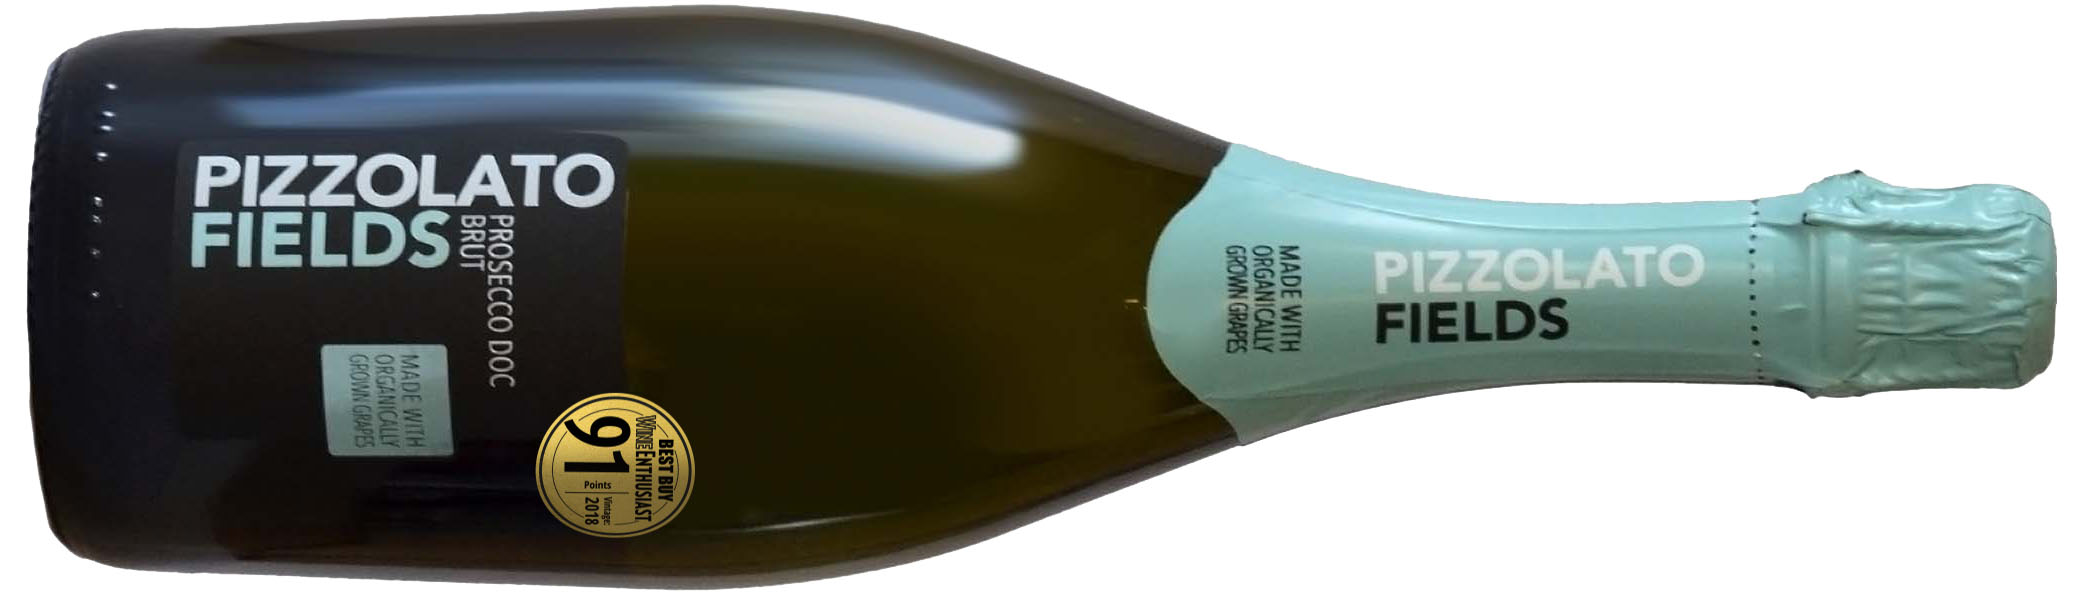 Pizzolato Fields Prosecco Spumante 90 Point Organic Wines